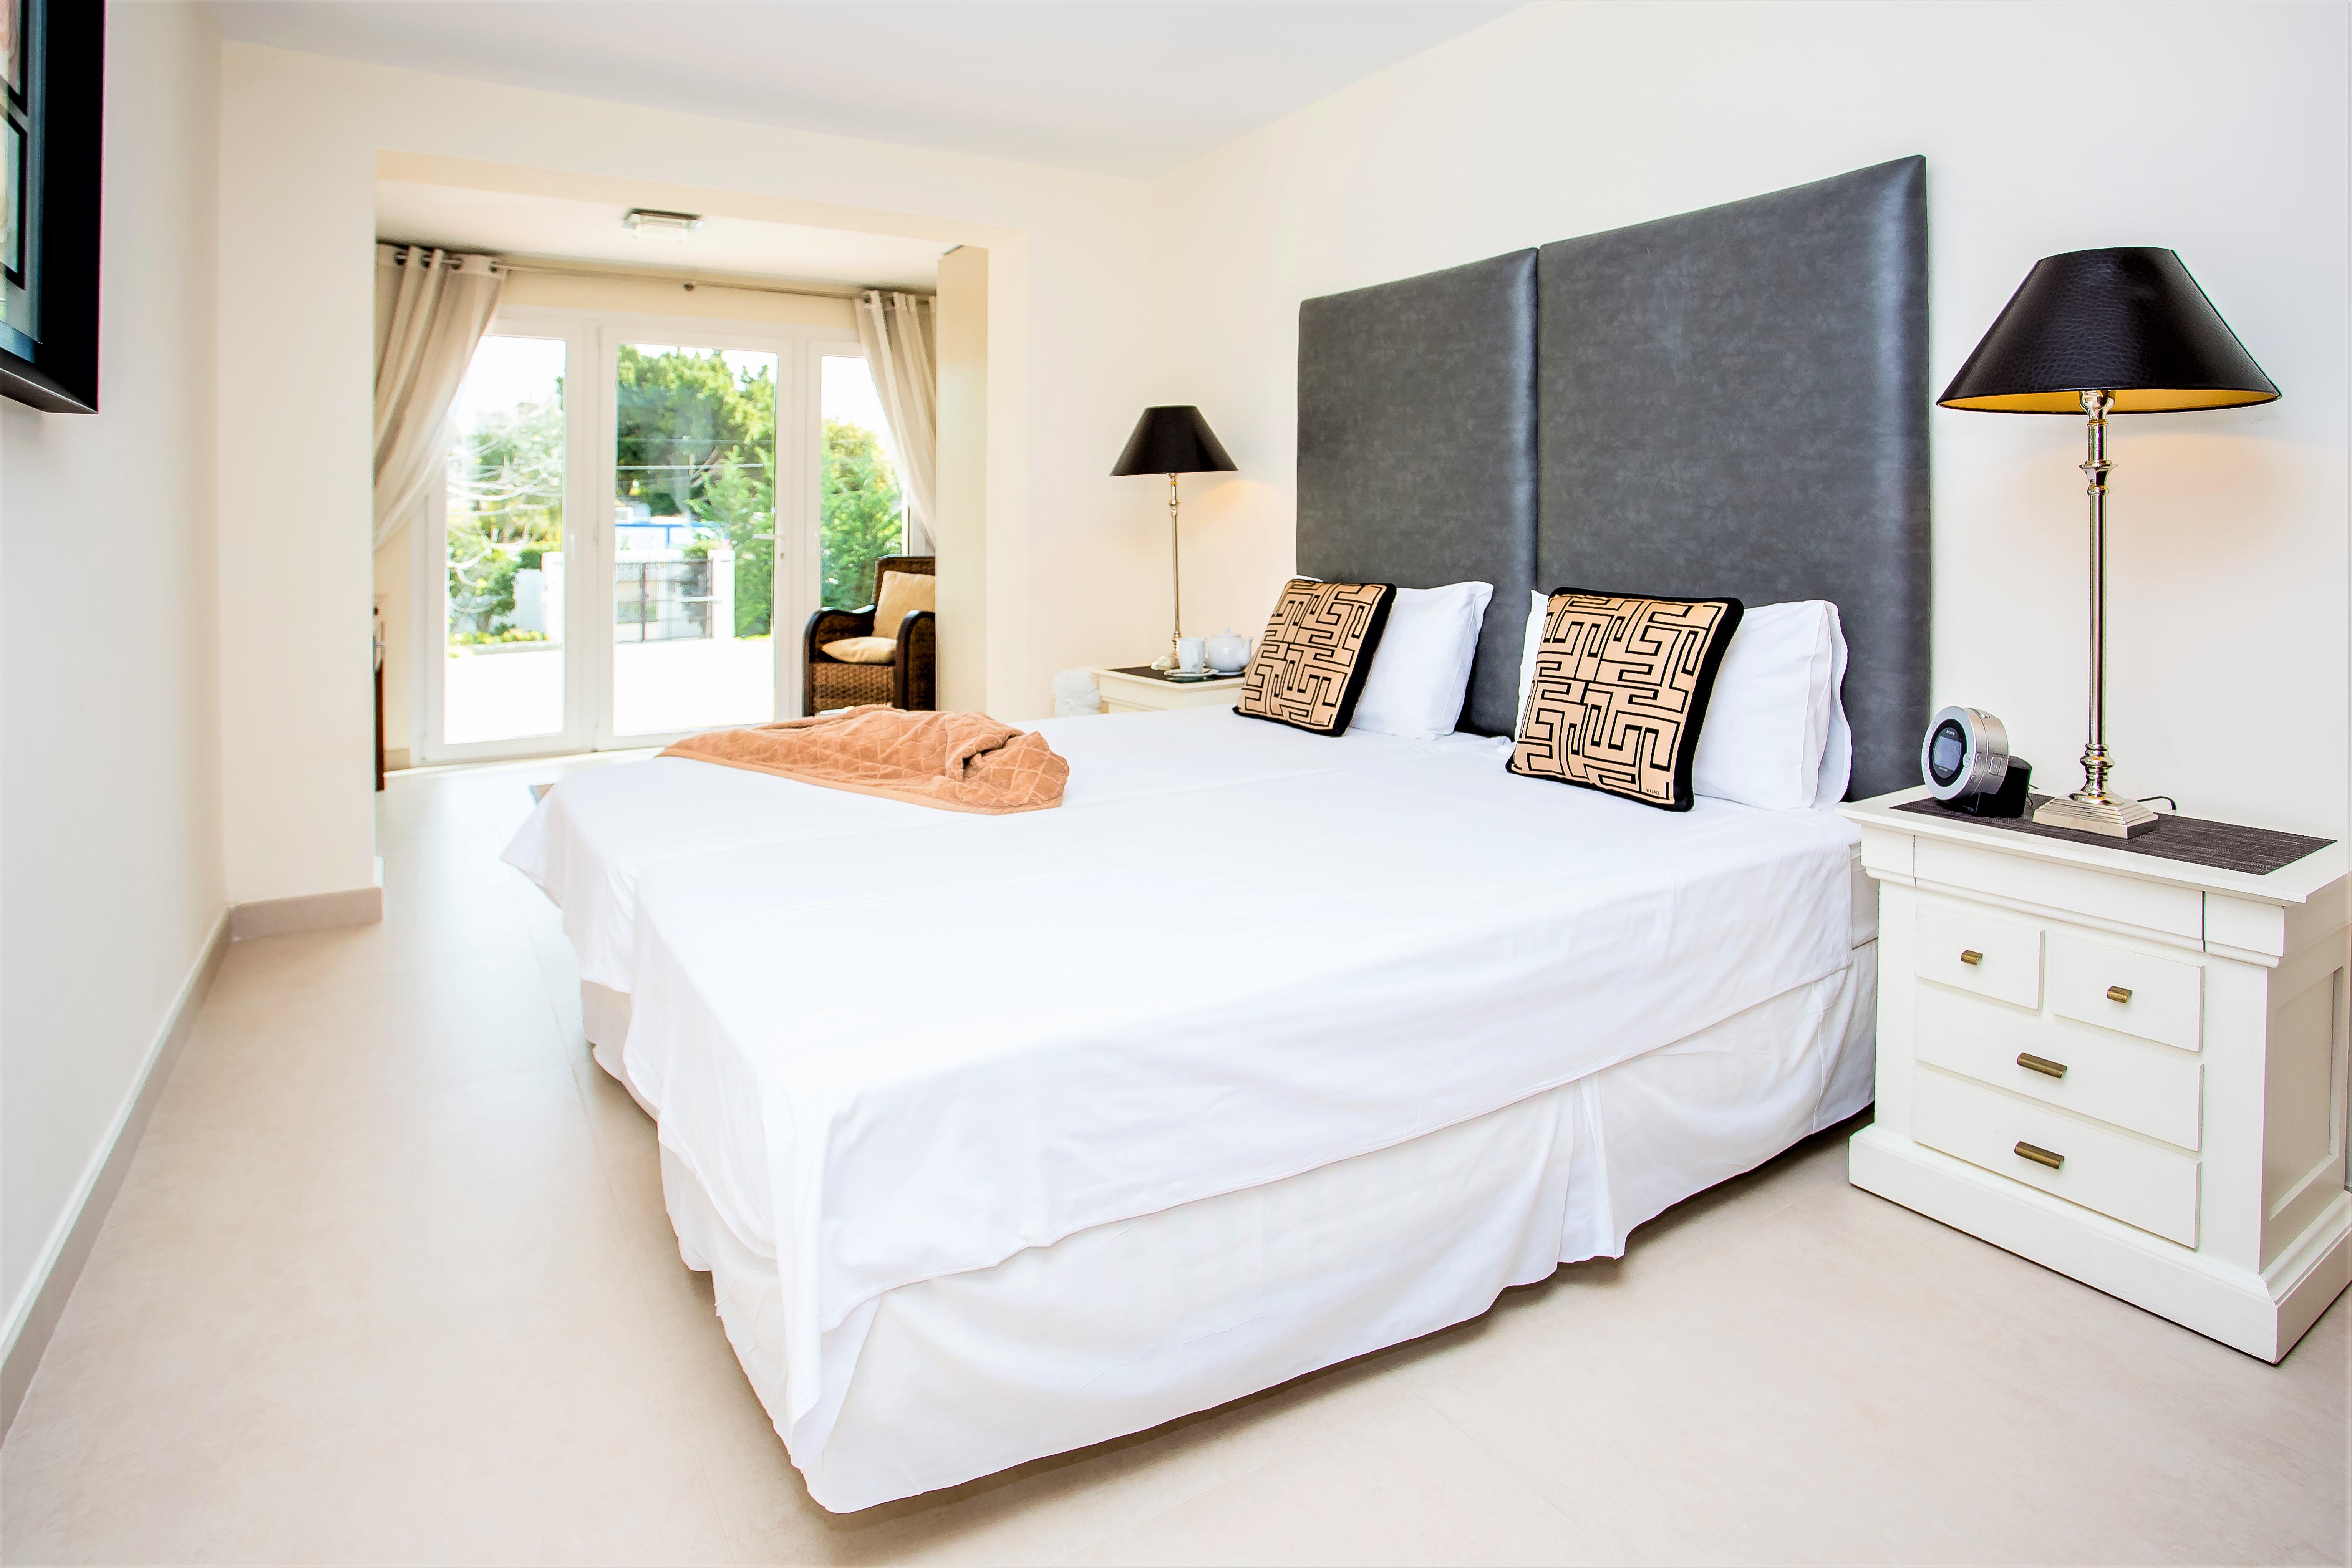 Apartment 4 B R  VILLA by Puerto Banus   Sea 5 m                                photo 20433348